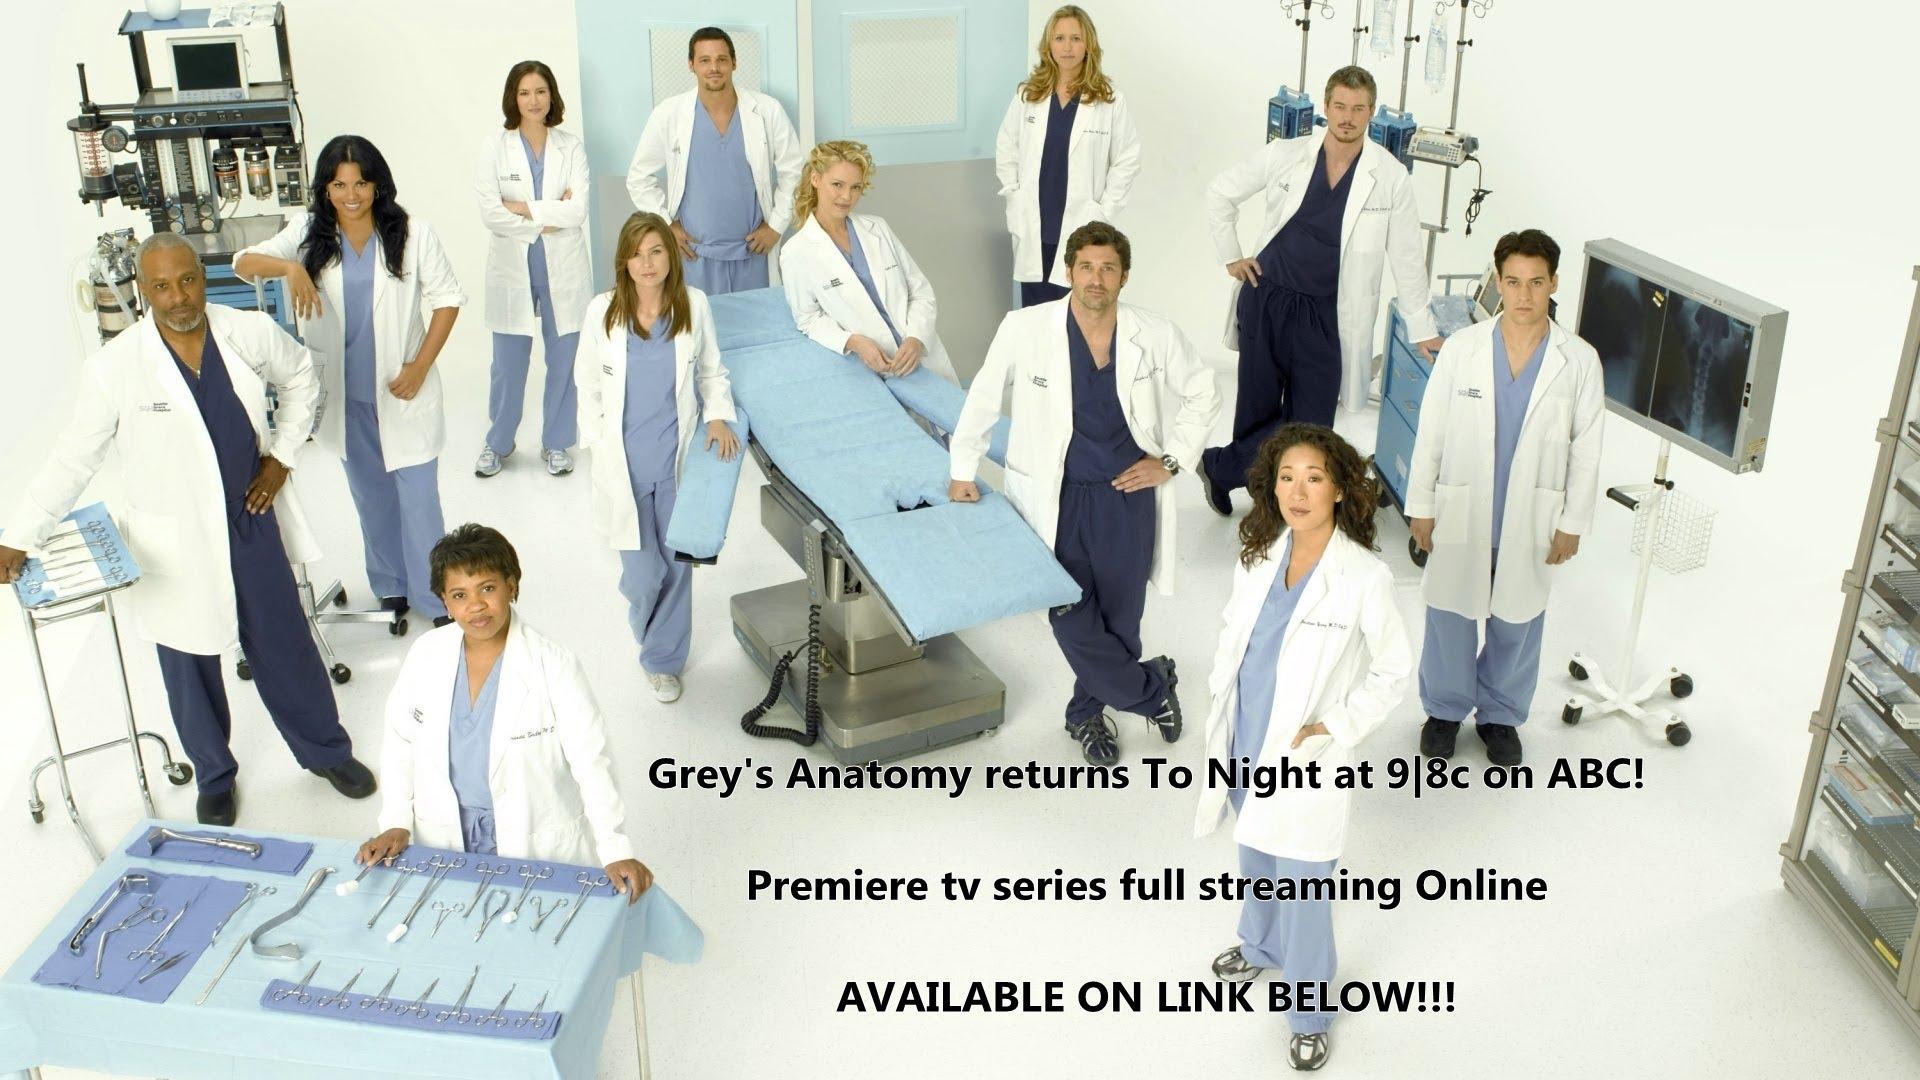 Free Stream Greys Anatomy Season 12 Episode 11 Live On Abc Online